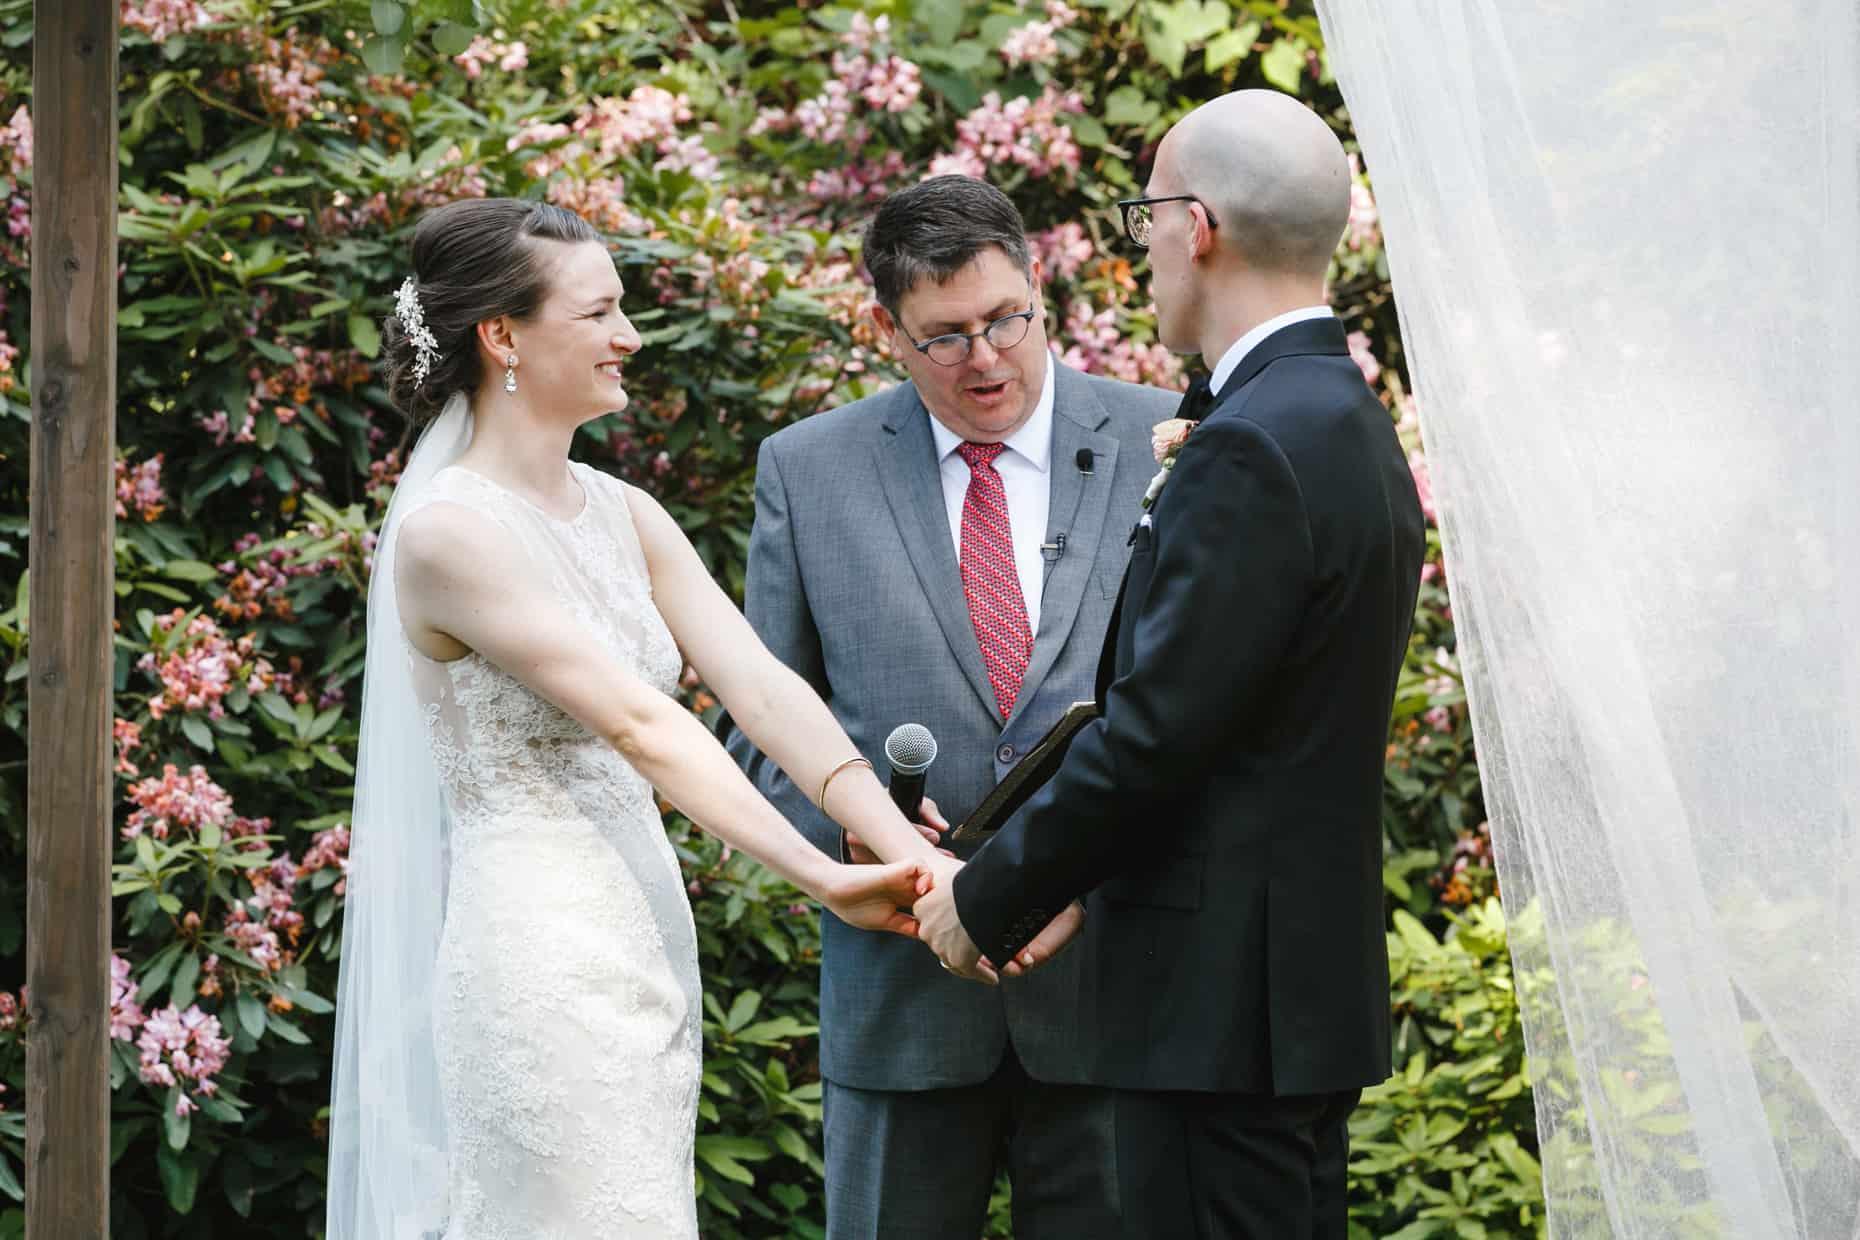 Philly wedding